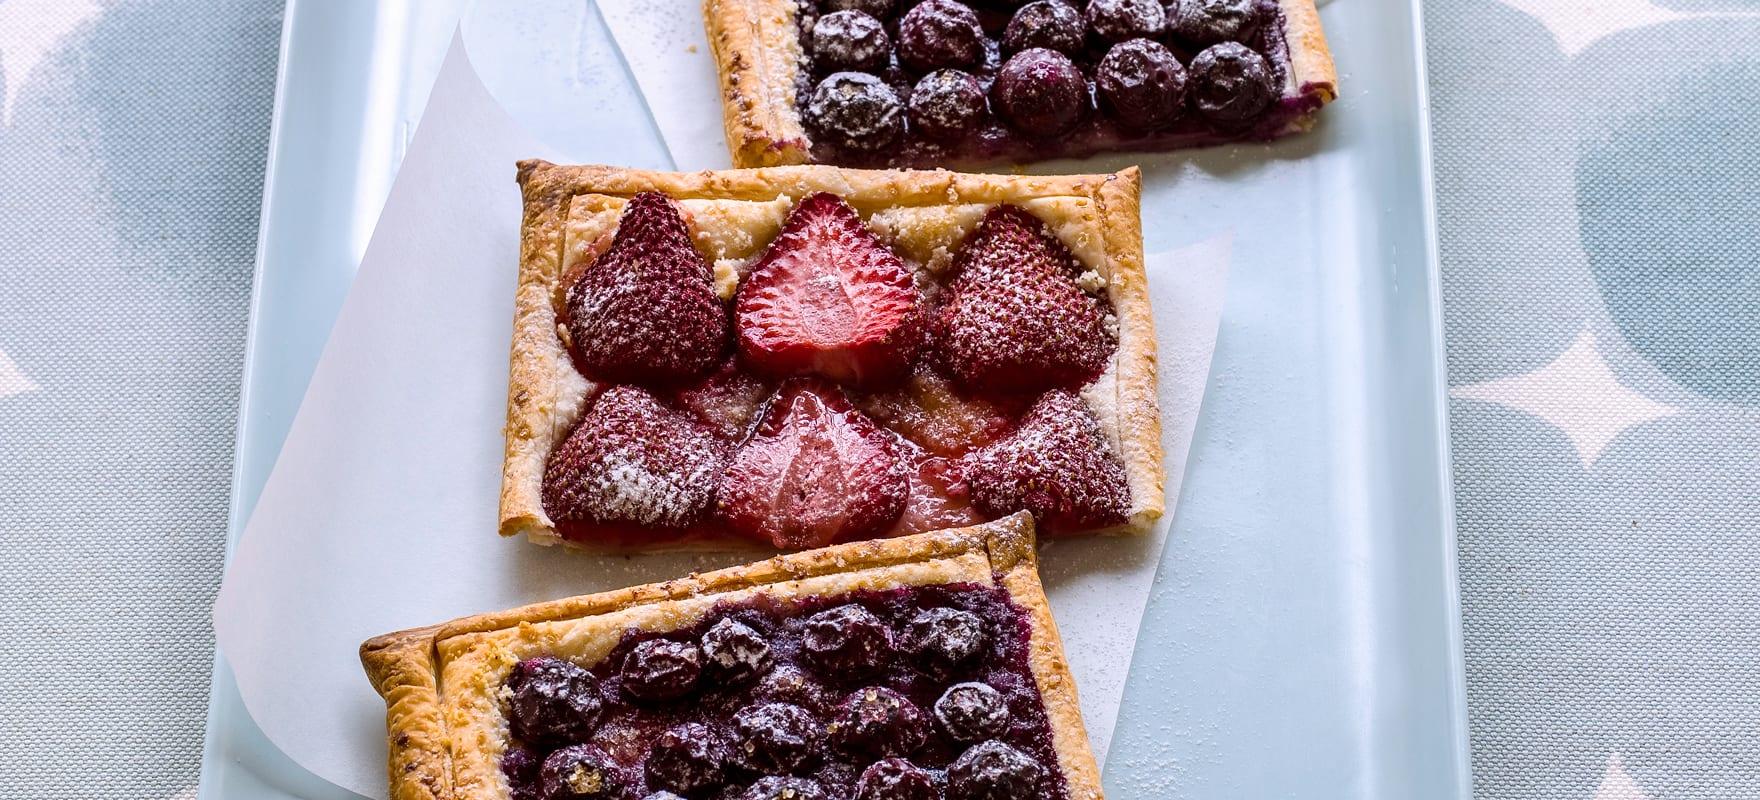 Berry tart image 1